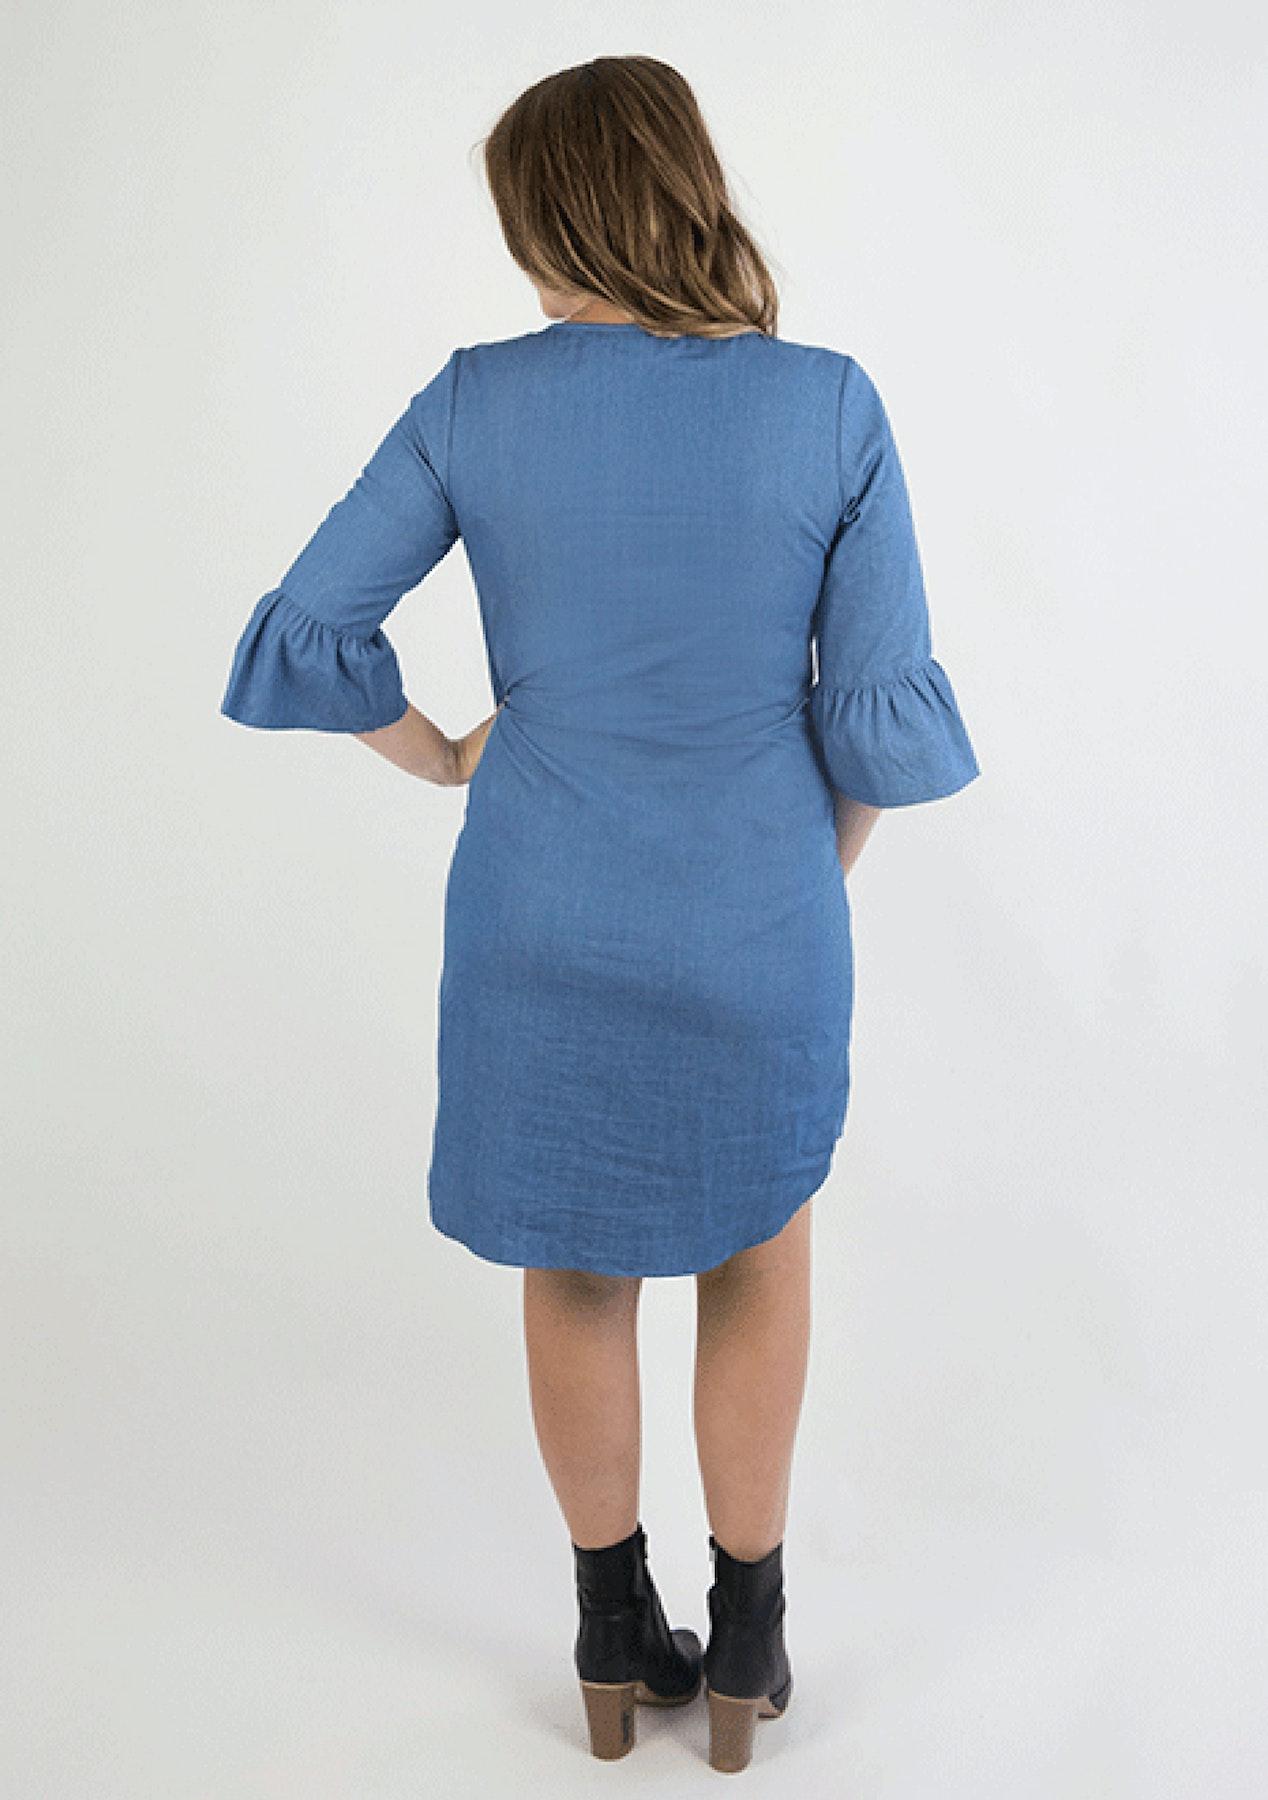 bd9cce3d8c1b8 Mrs Smith - Ava Denim Breastfeeding Dress - Chambray Blue - The Maternity  Shop - Onceit